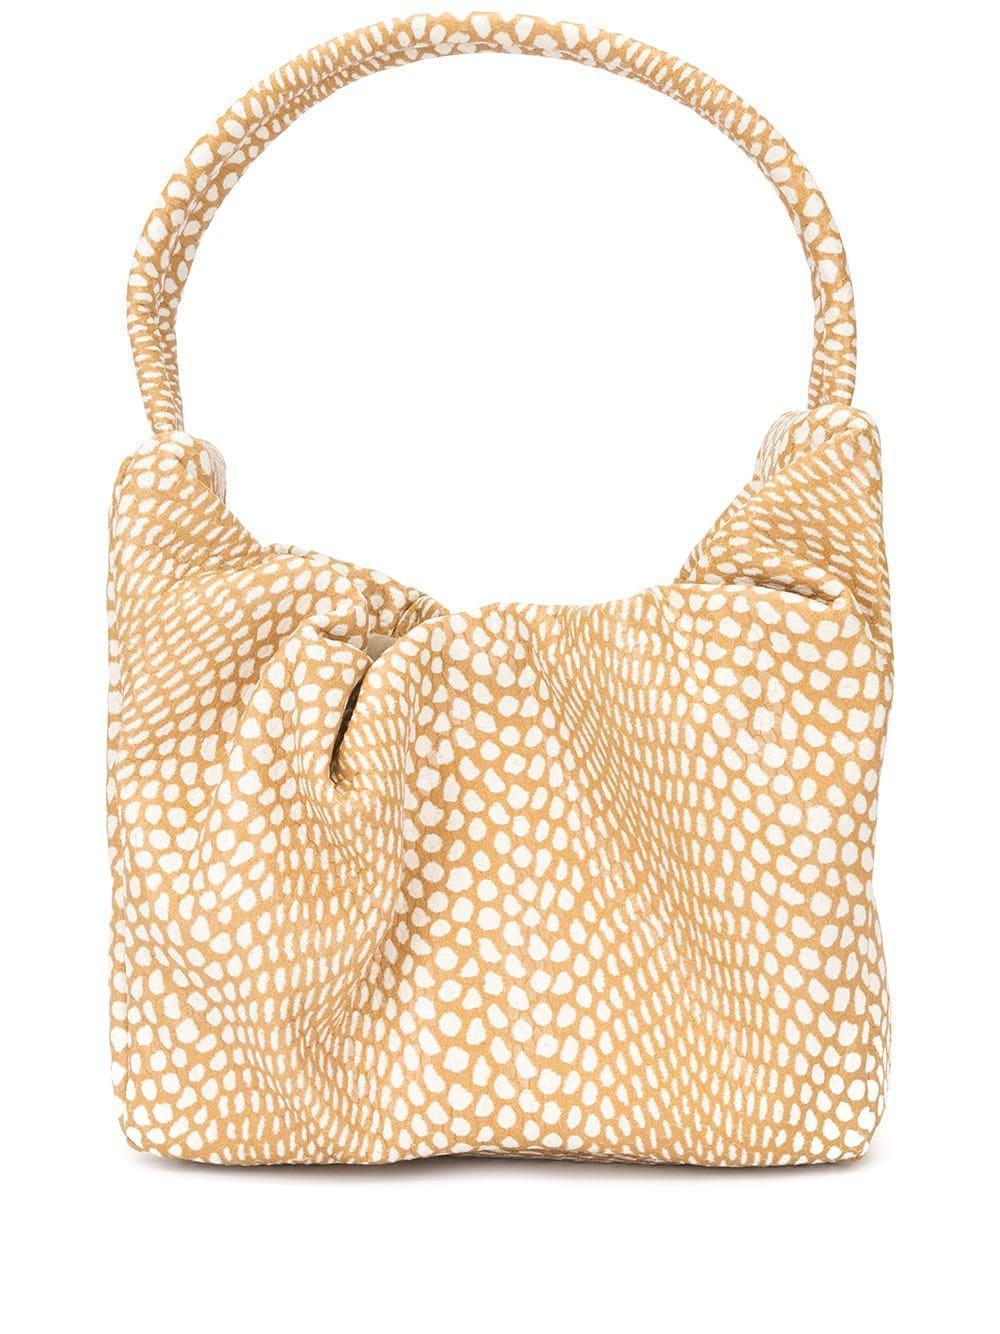 Felix Snake Print Bag Item # 219-9217-FAWN